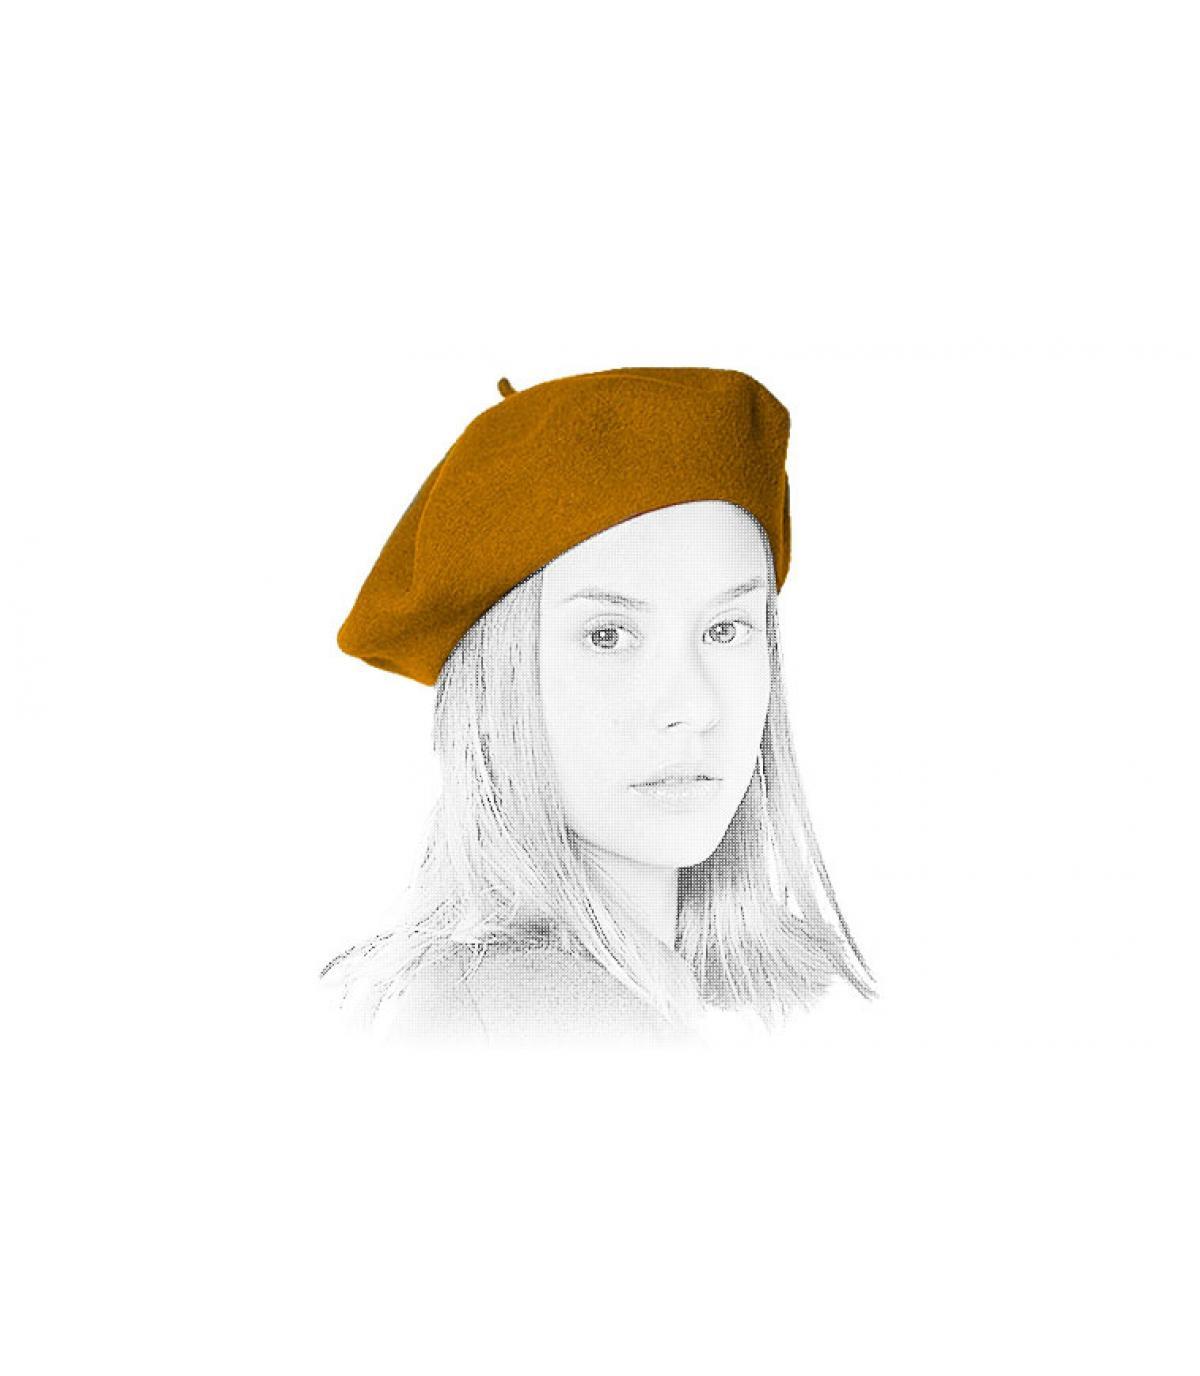 biona beis Laulhère